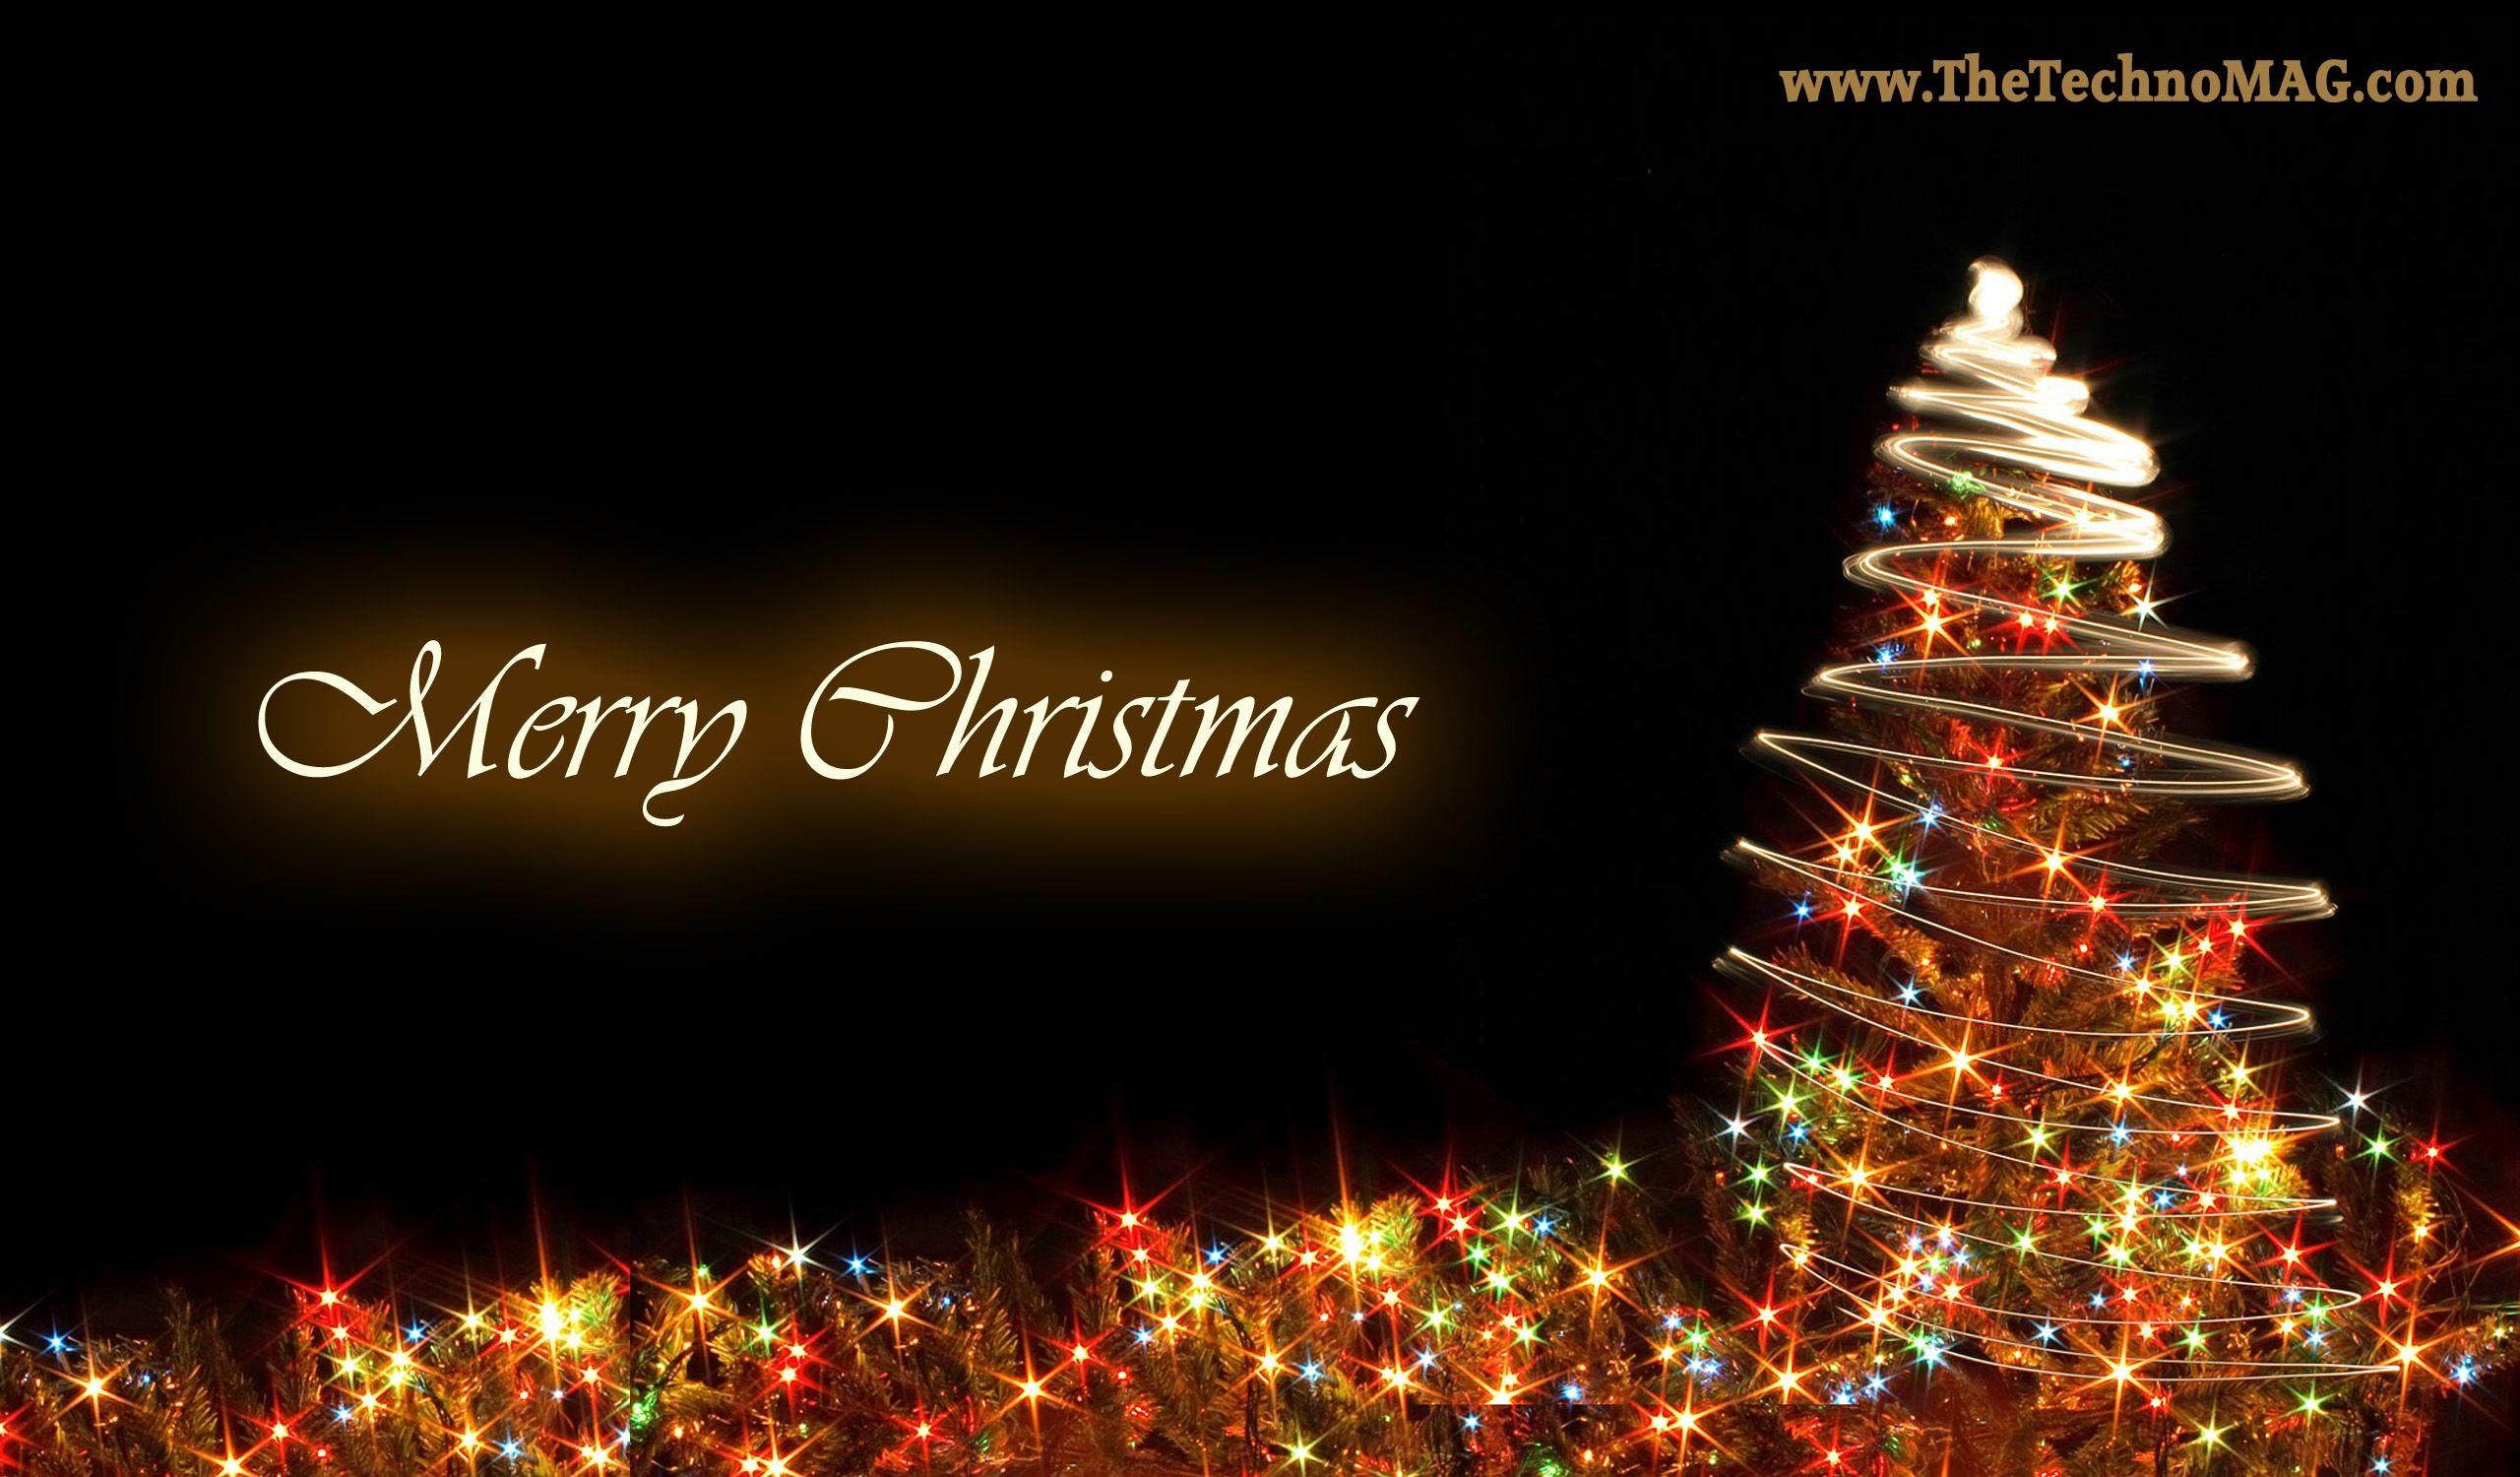 Cute Christmas Wallpaper Desktop (62+ images)